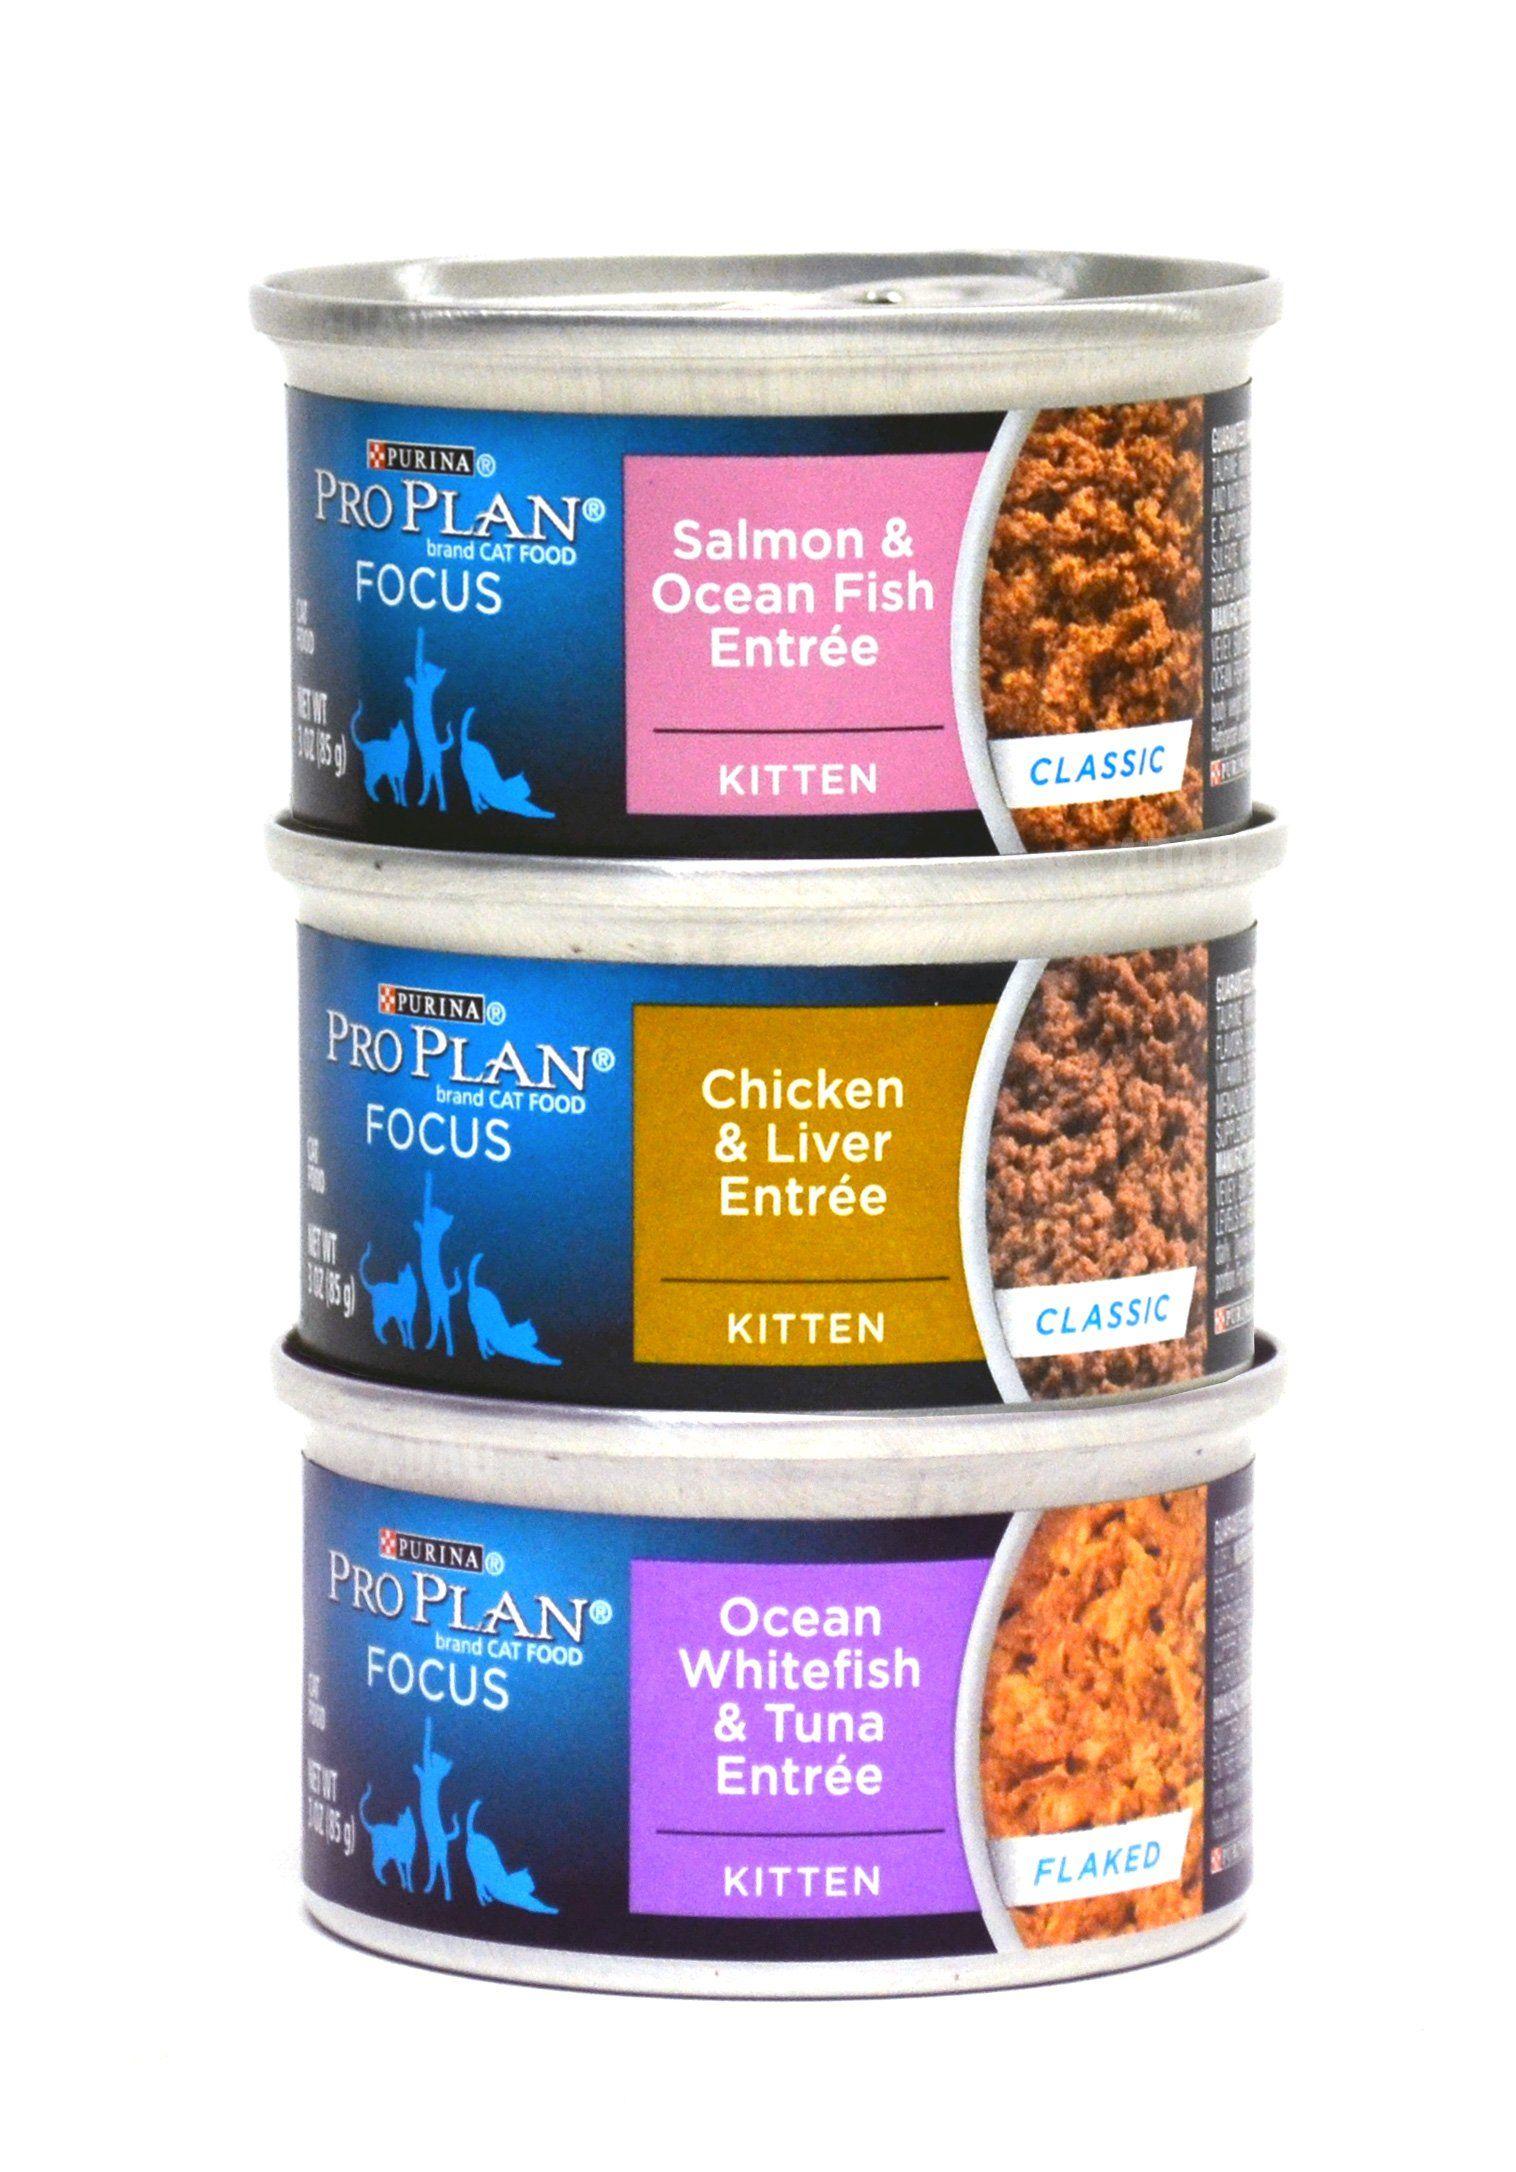 Purina pro plan focus canned cat kitten food variety